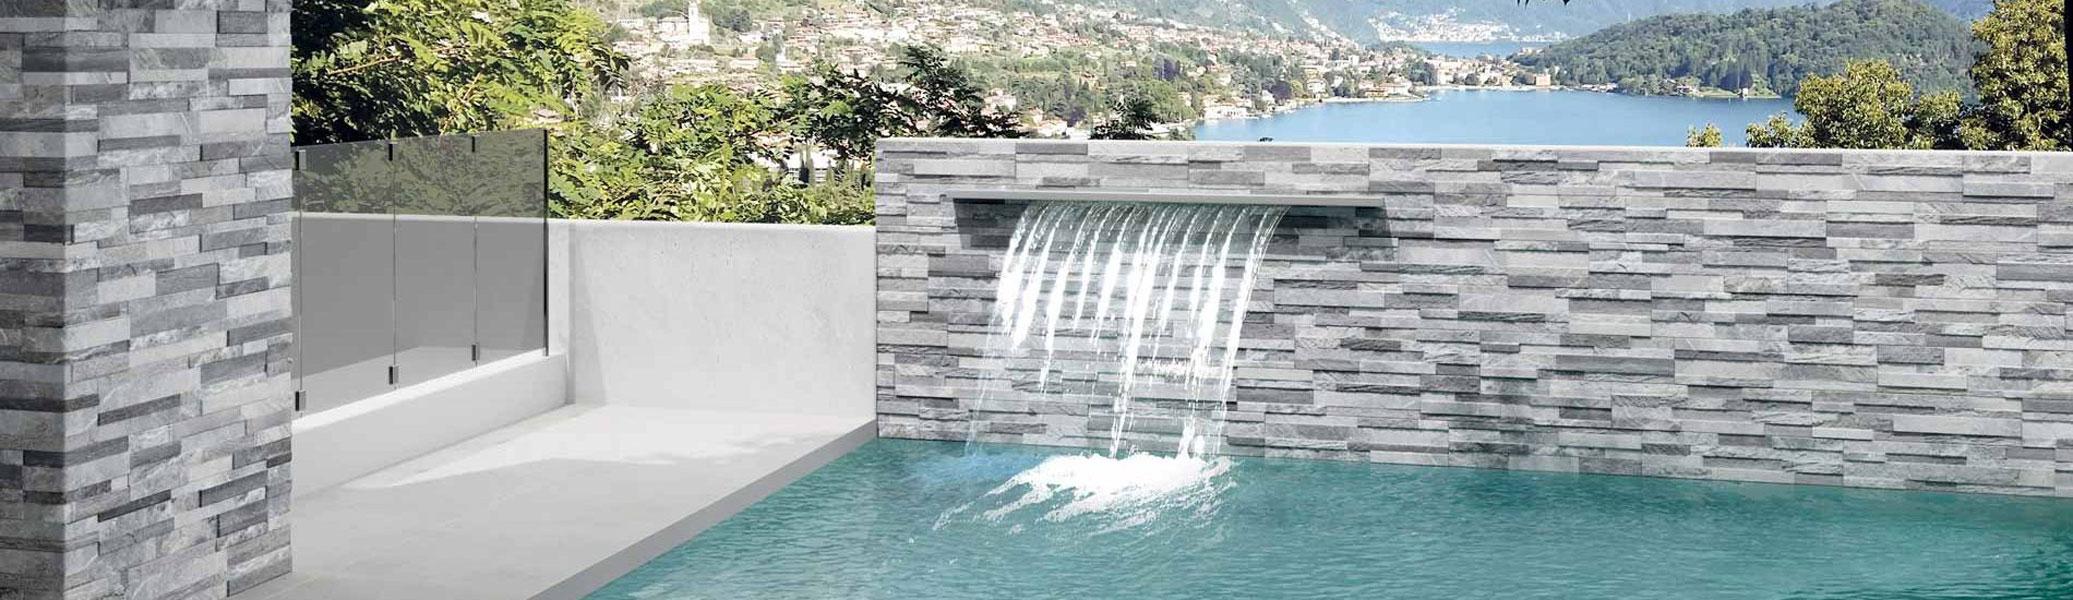 banner-tiffany-italian-stone-look-wall-tile-ceramica-rondine-1900x550